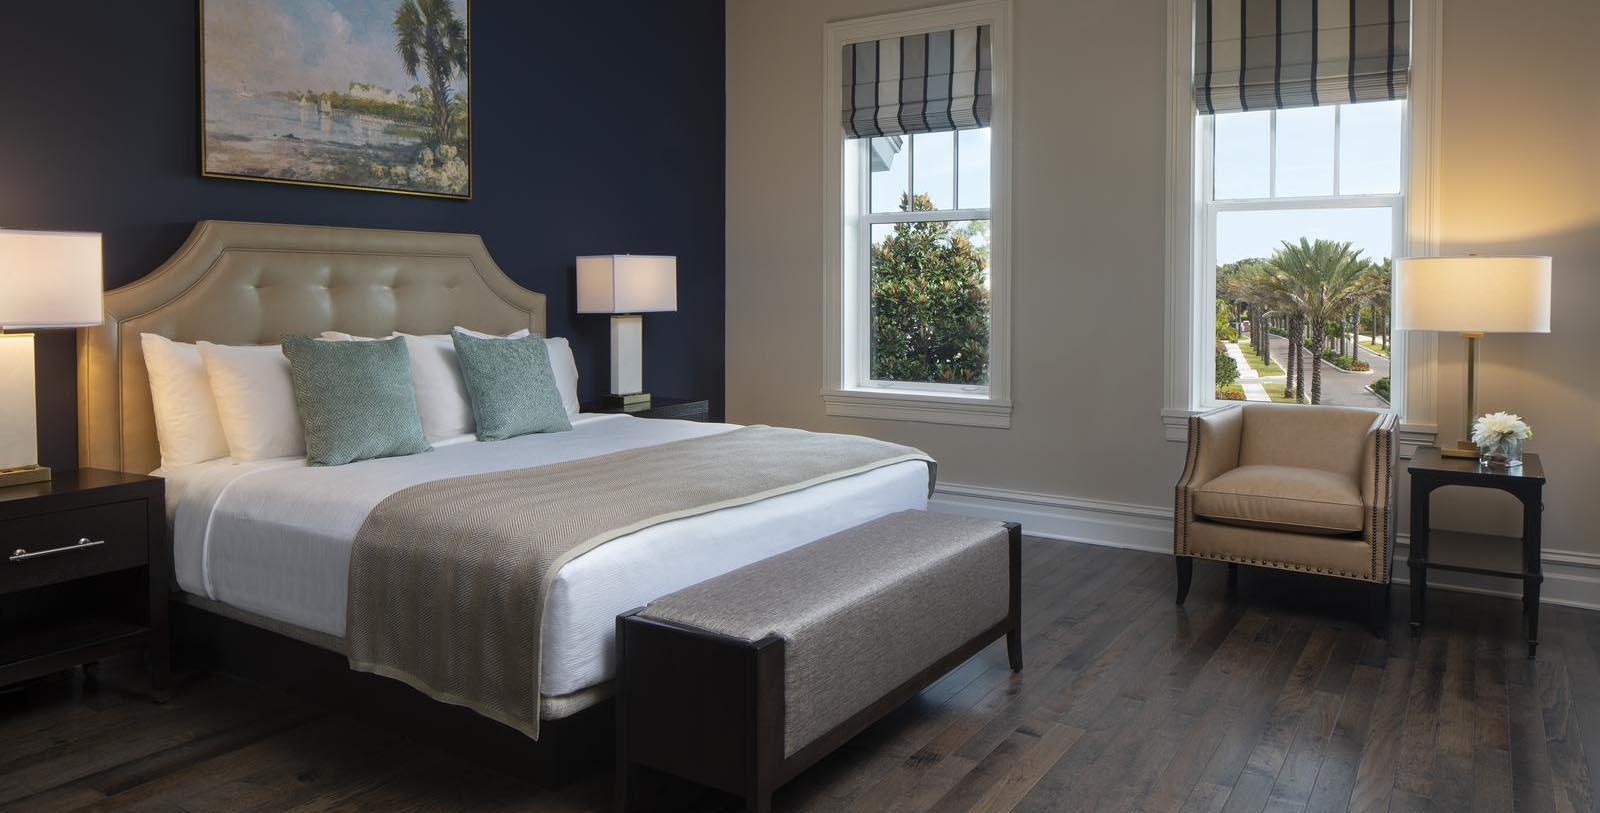 Image of Guestroom at Belleview Inn, 1897, Member of Historic Hotels of America, in Belleair, Florida, Accommodations